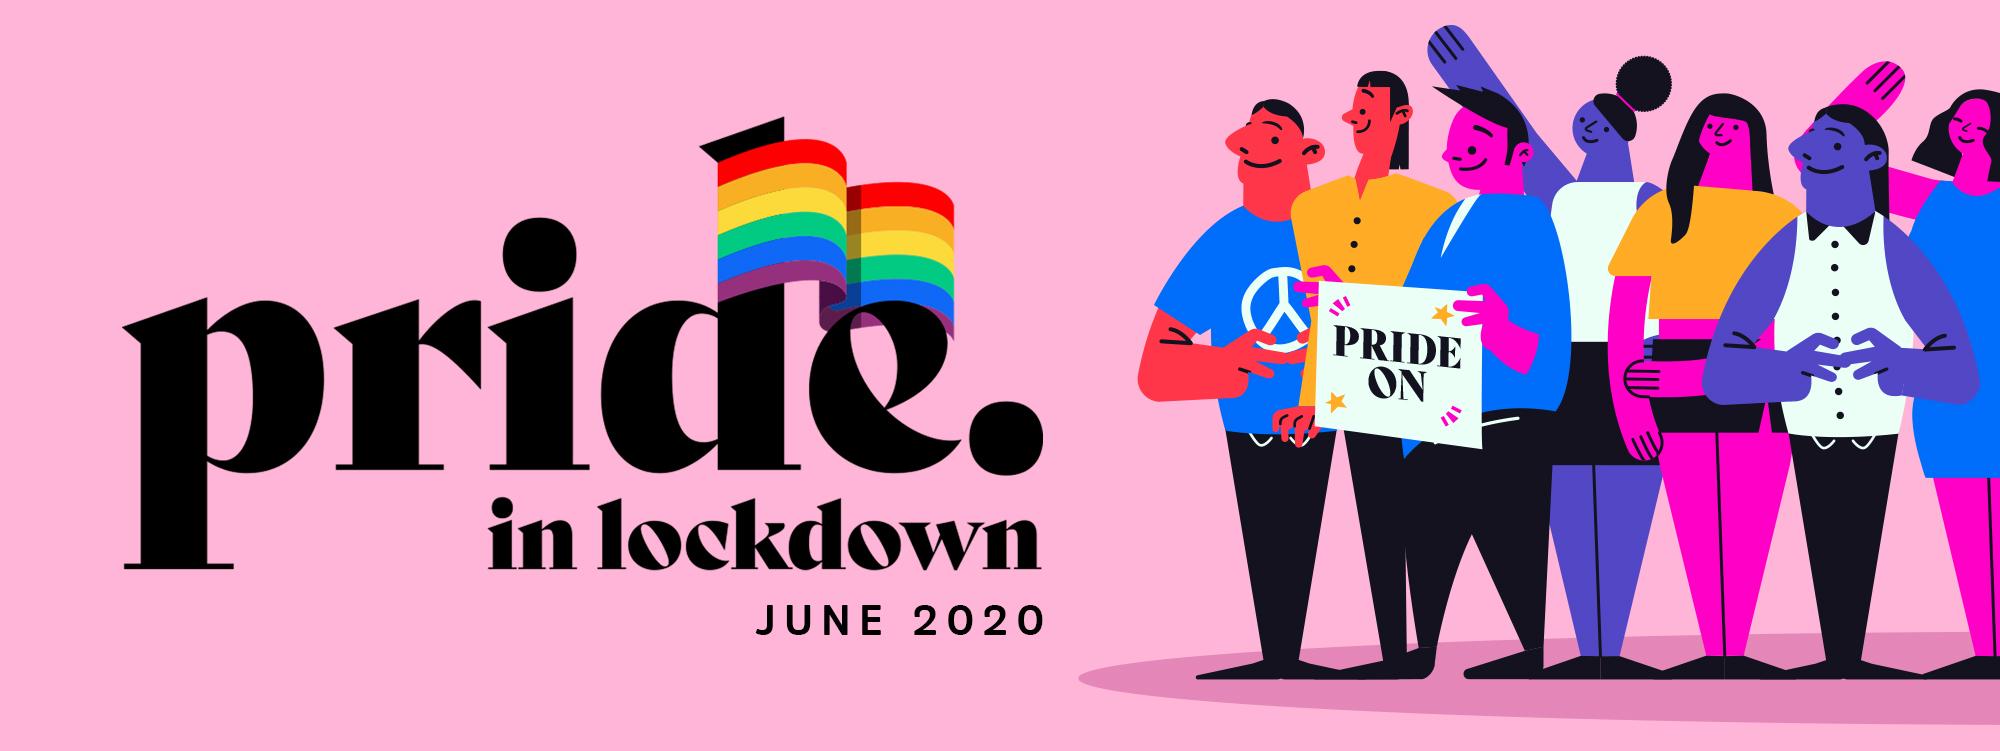 Pridelockdown website banner